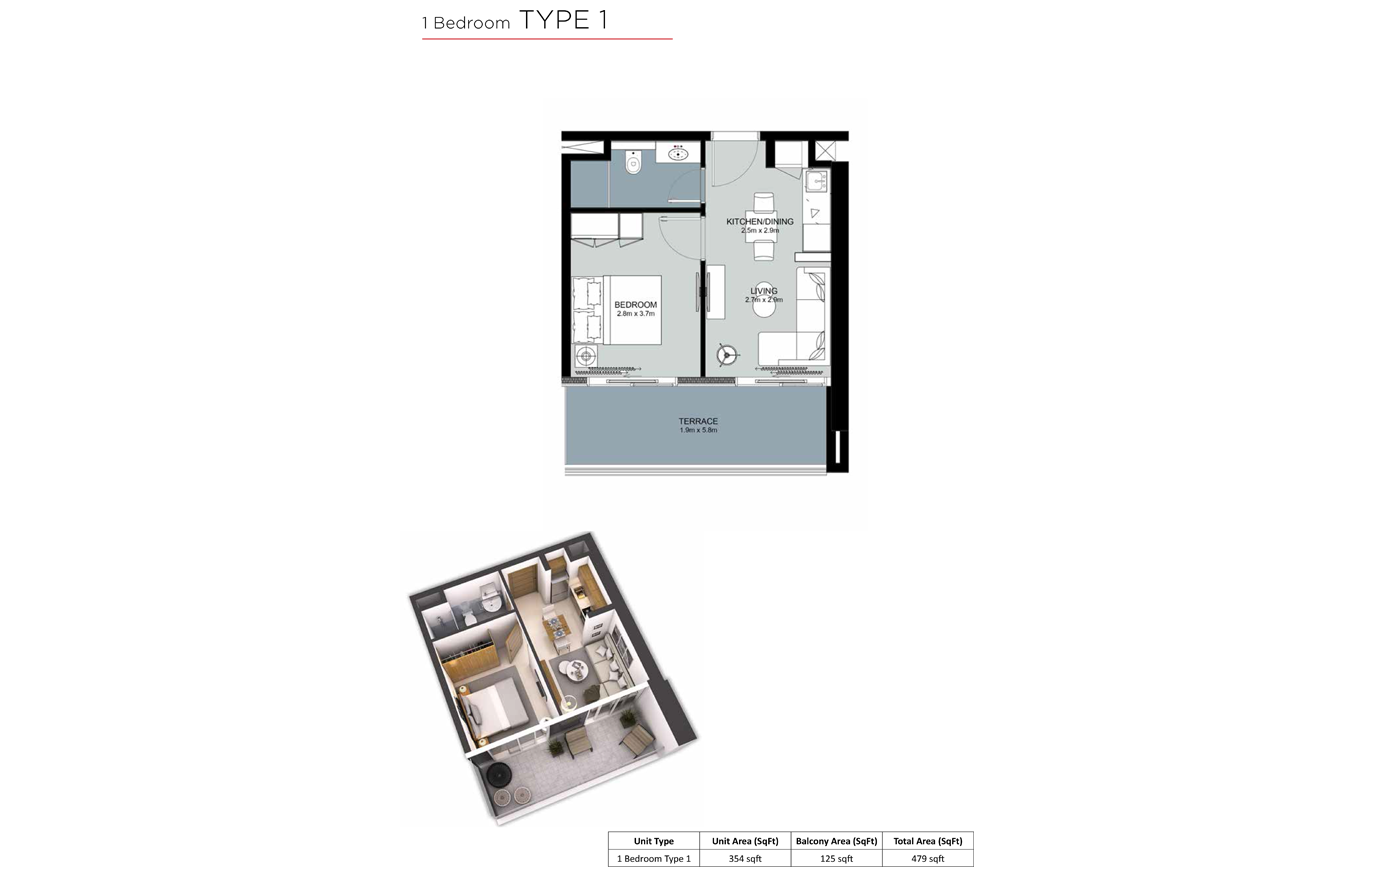 1 Bedroom Type 1, Size 479 sq.ft